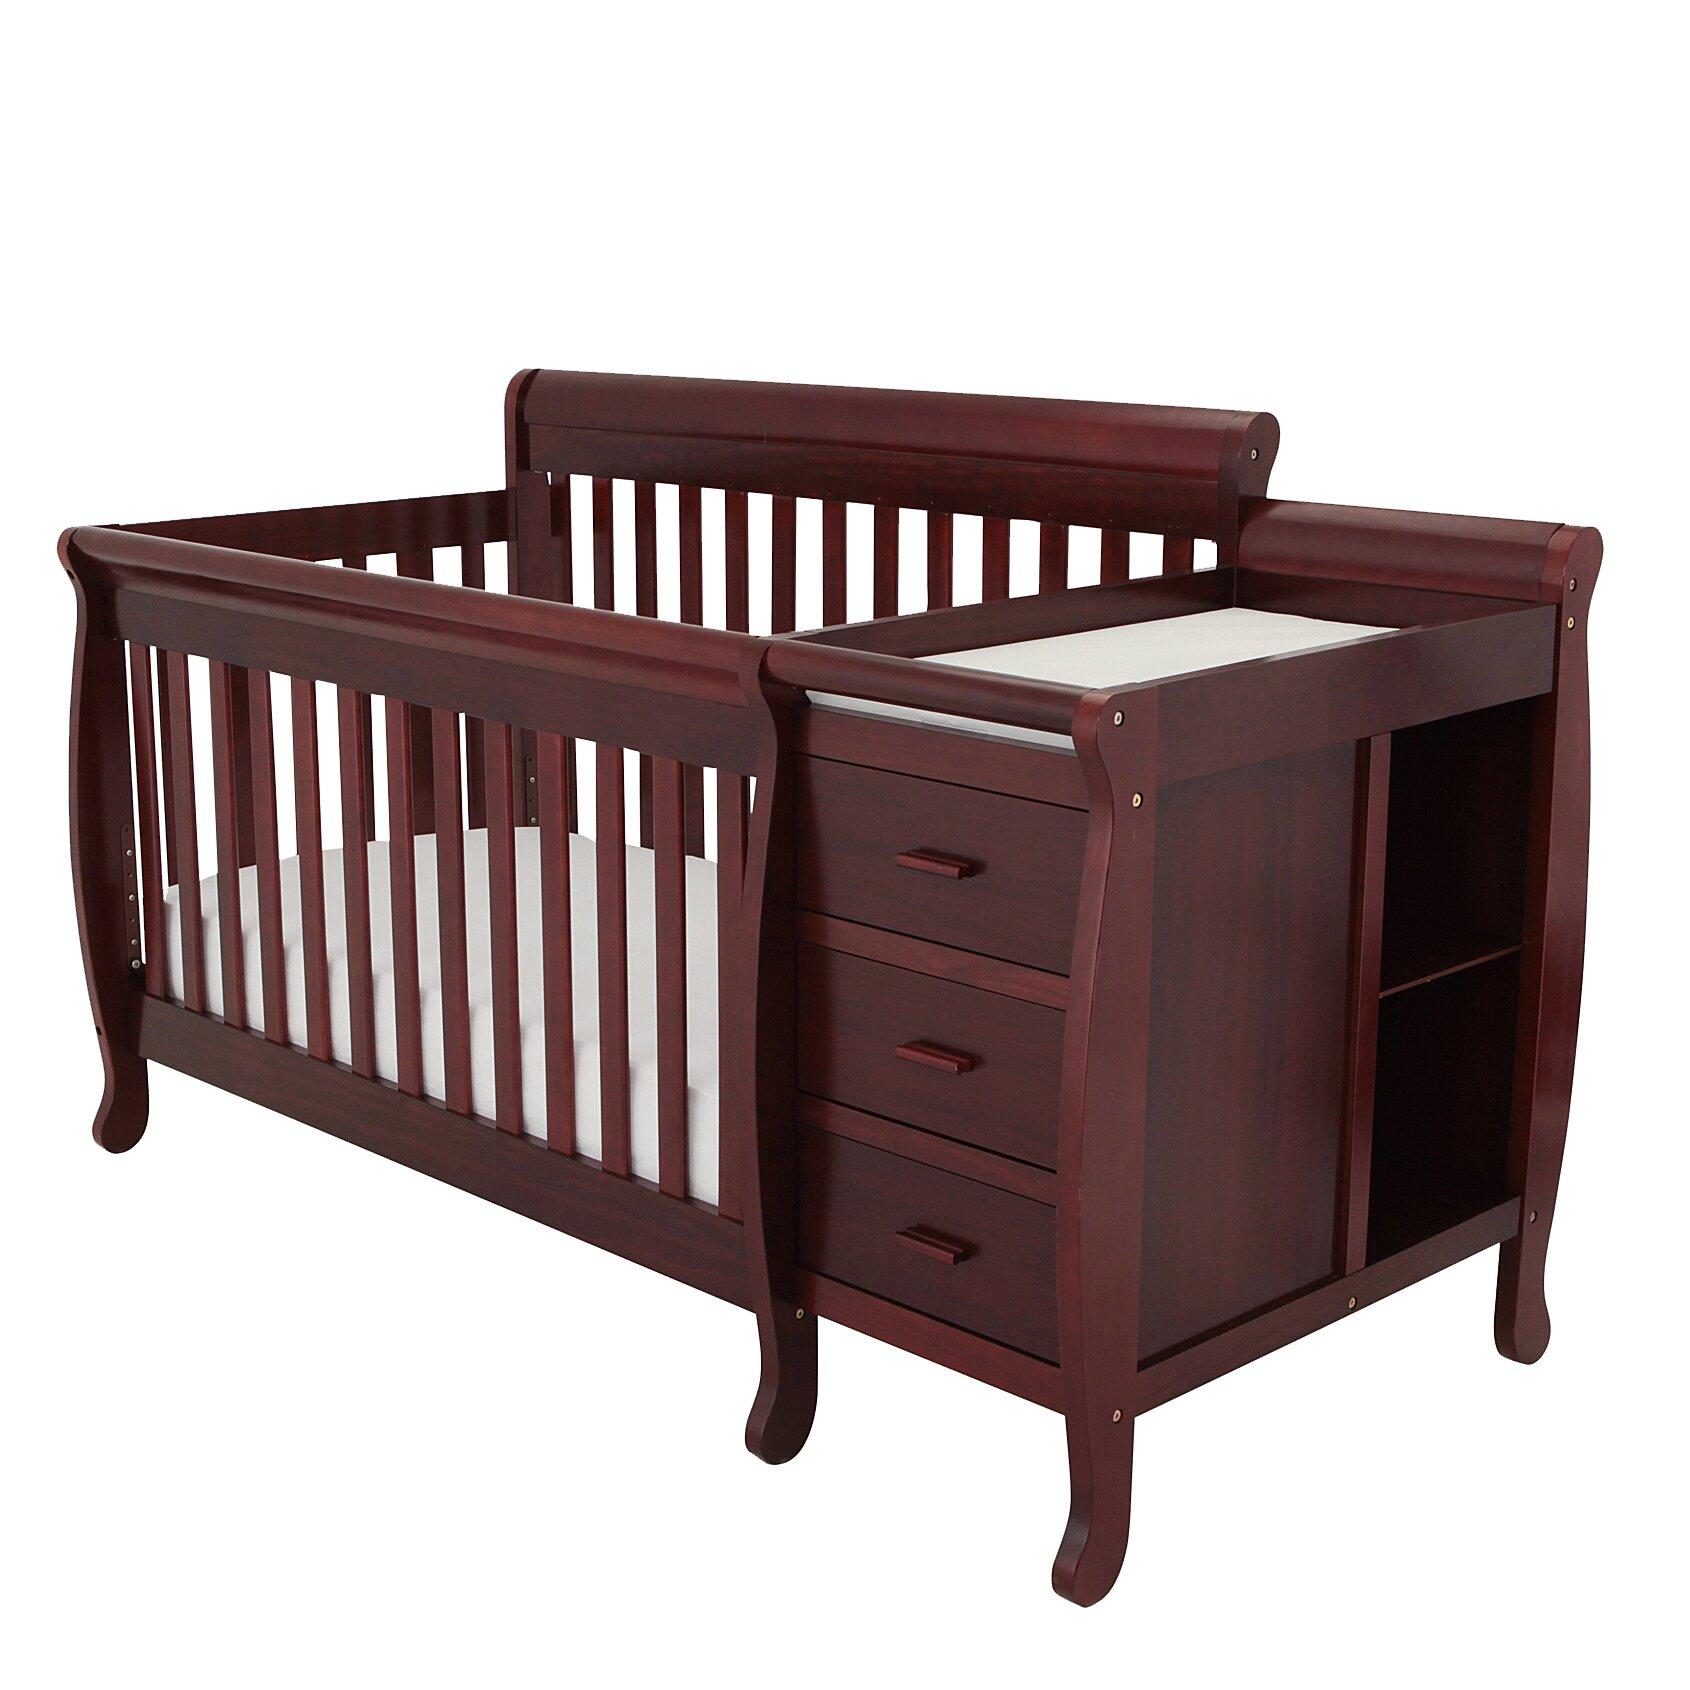 afg international furniture 3 in 1 convertible crib reviews wayfair